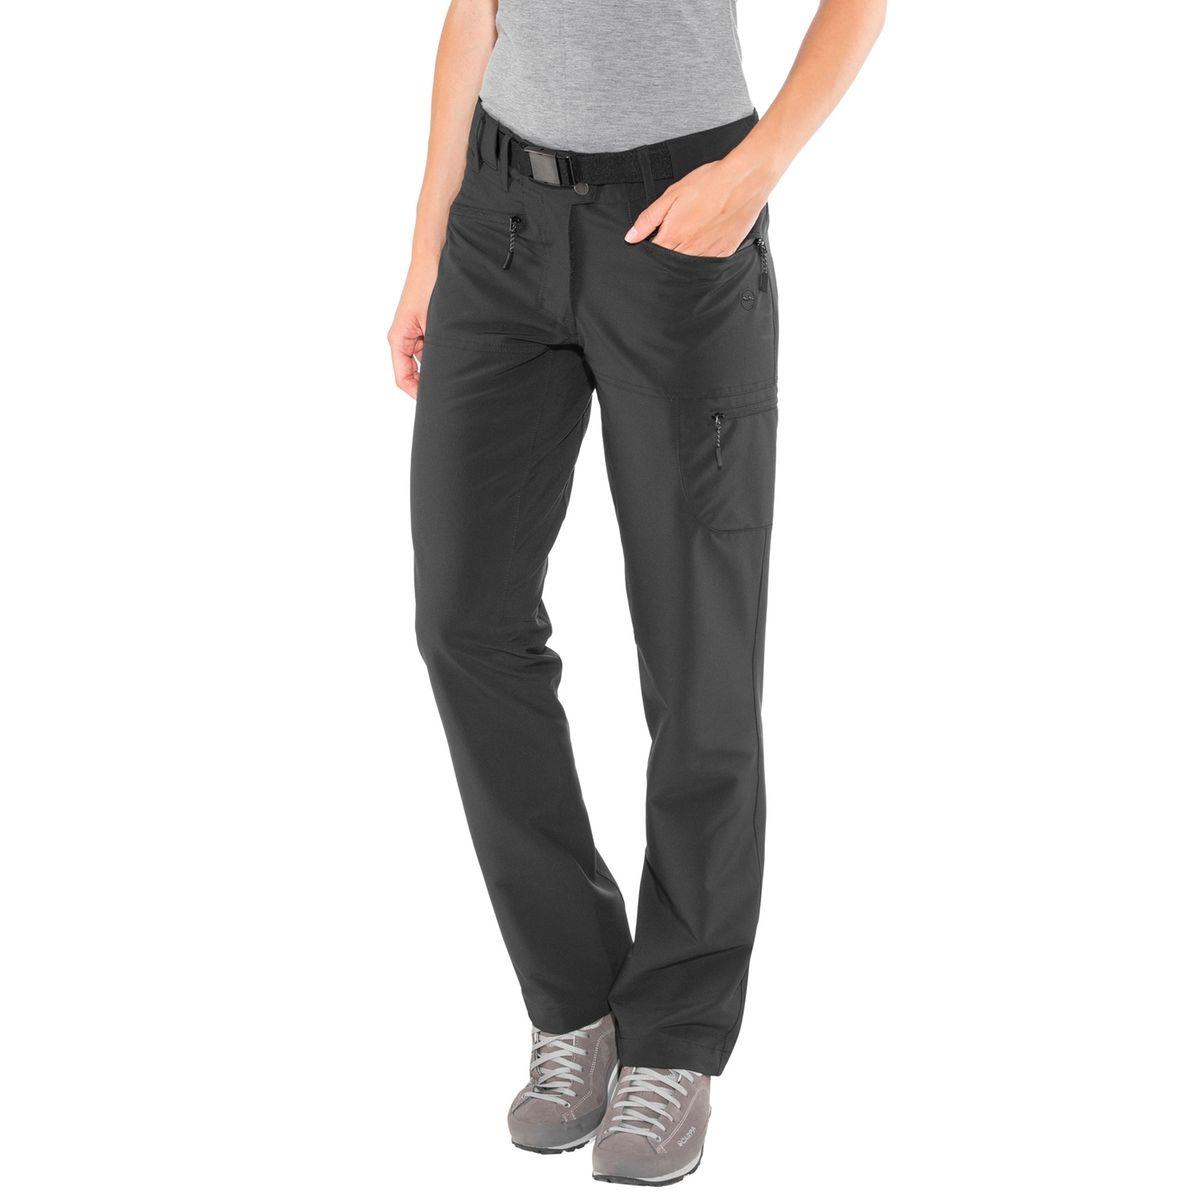 Montana - Pantalon long Femme - noir